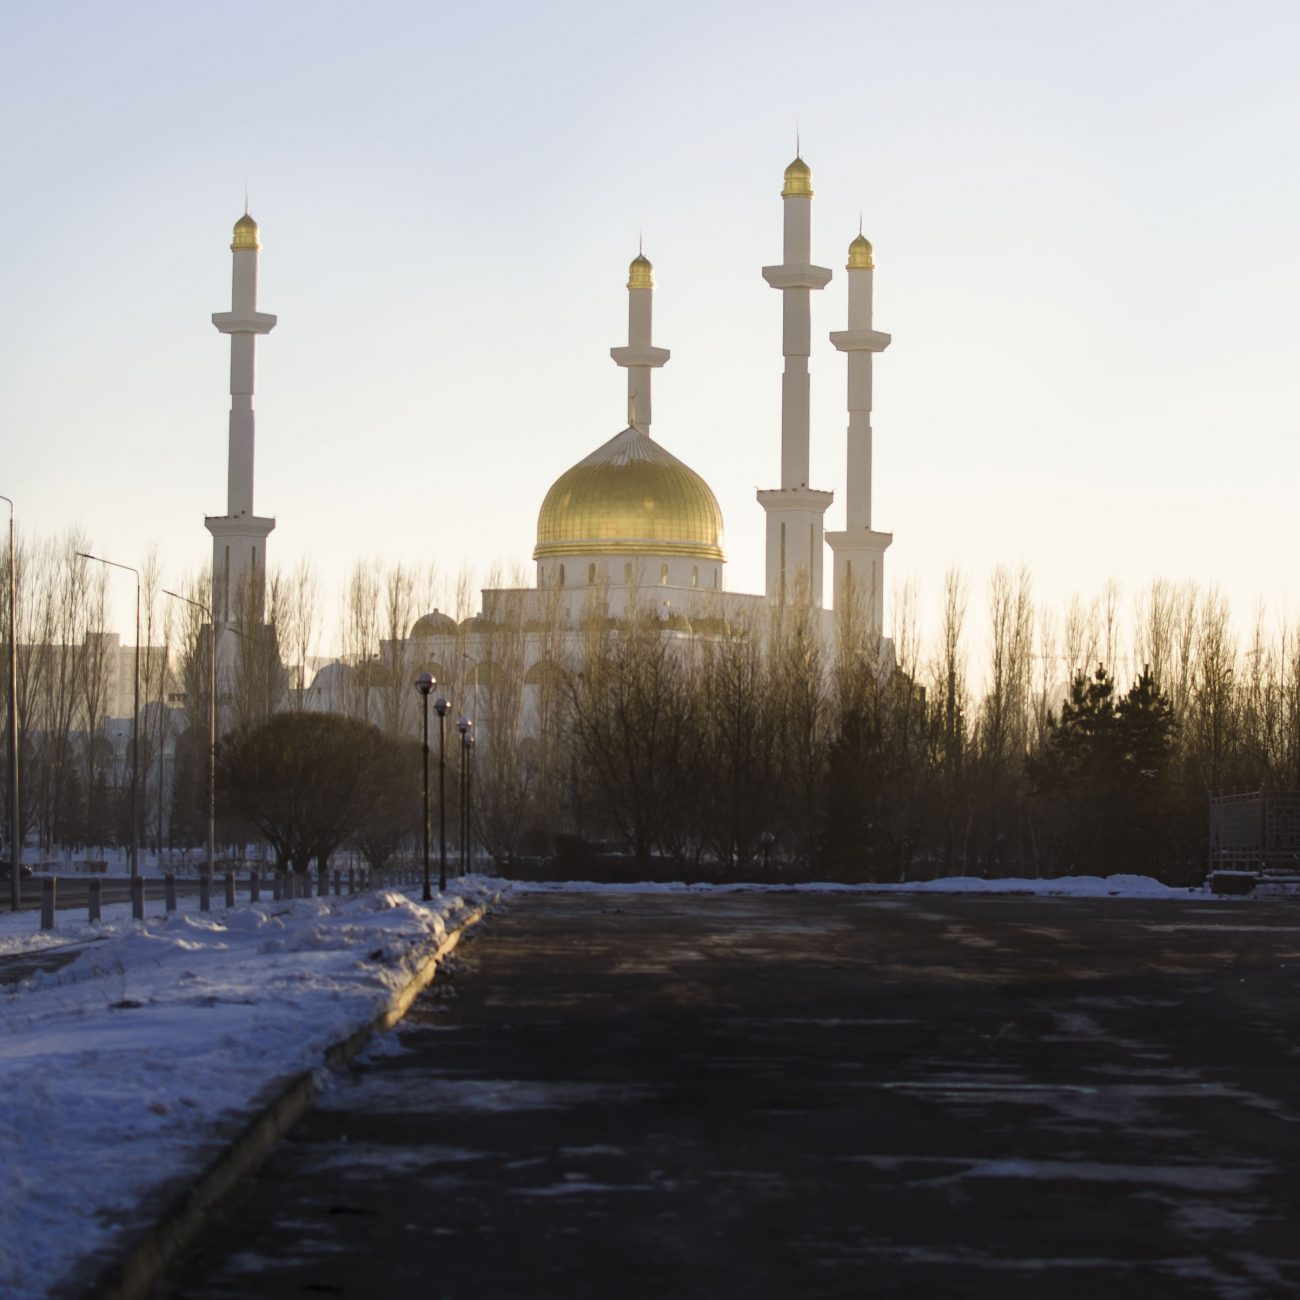 Nour-Astana Astana Mosquée Kazakhstan